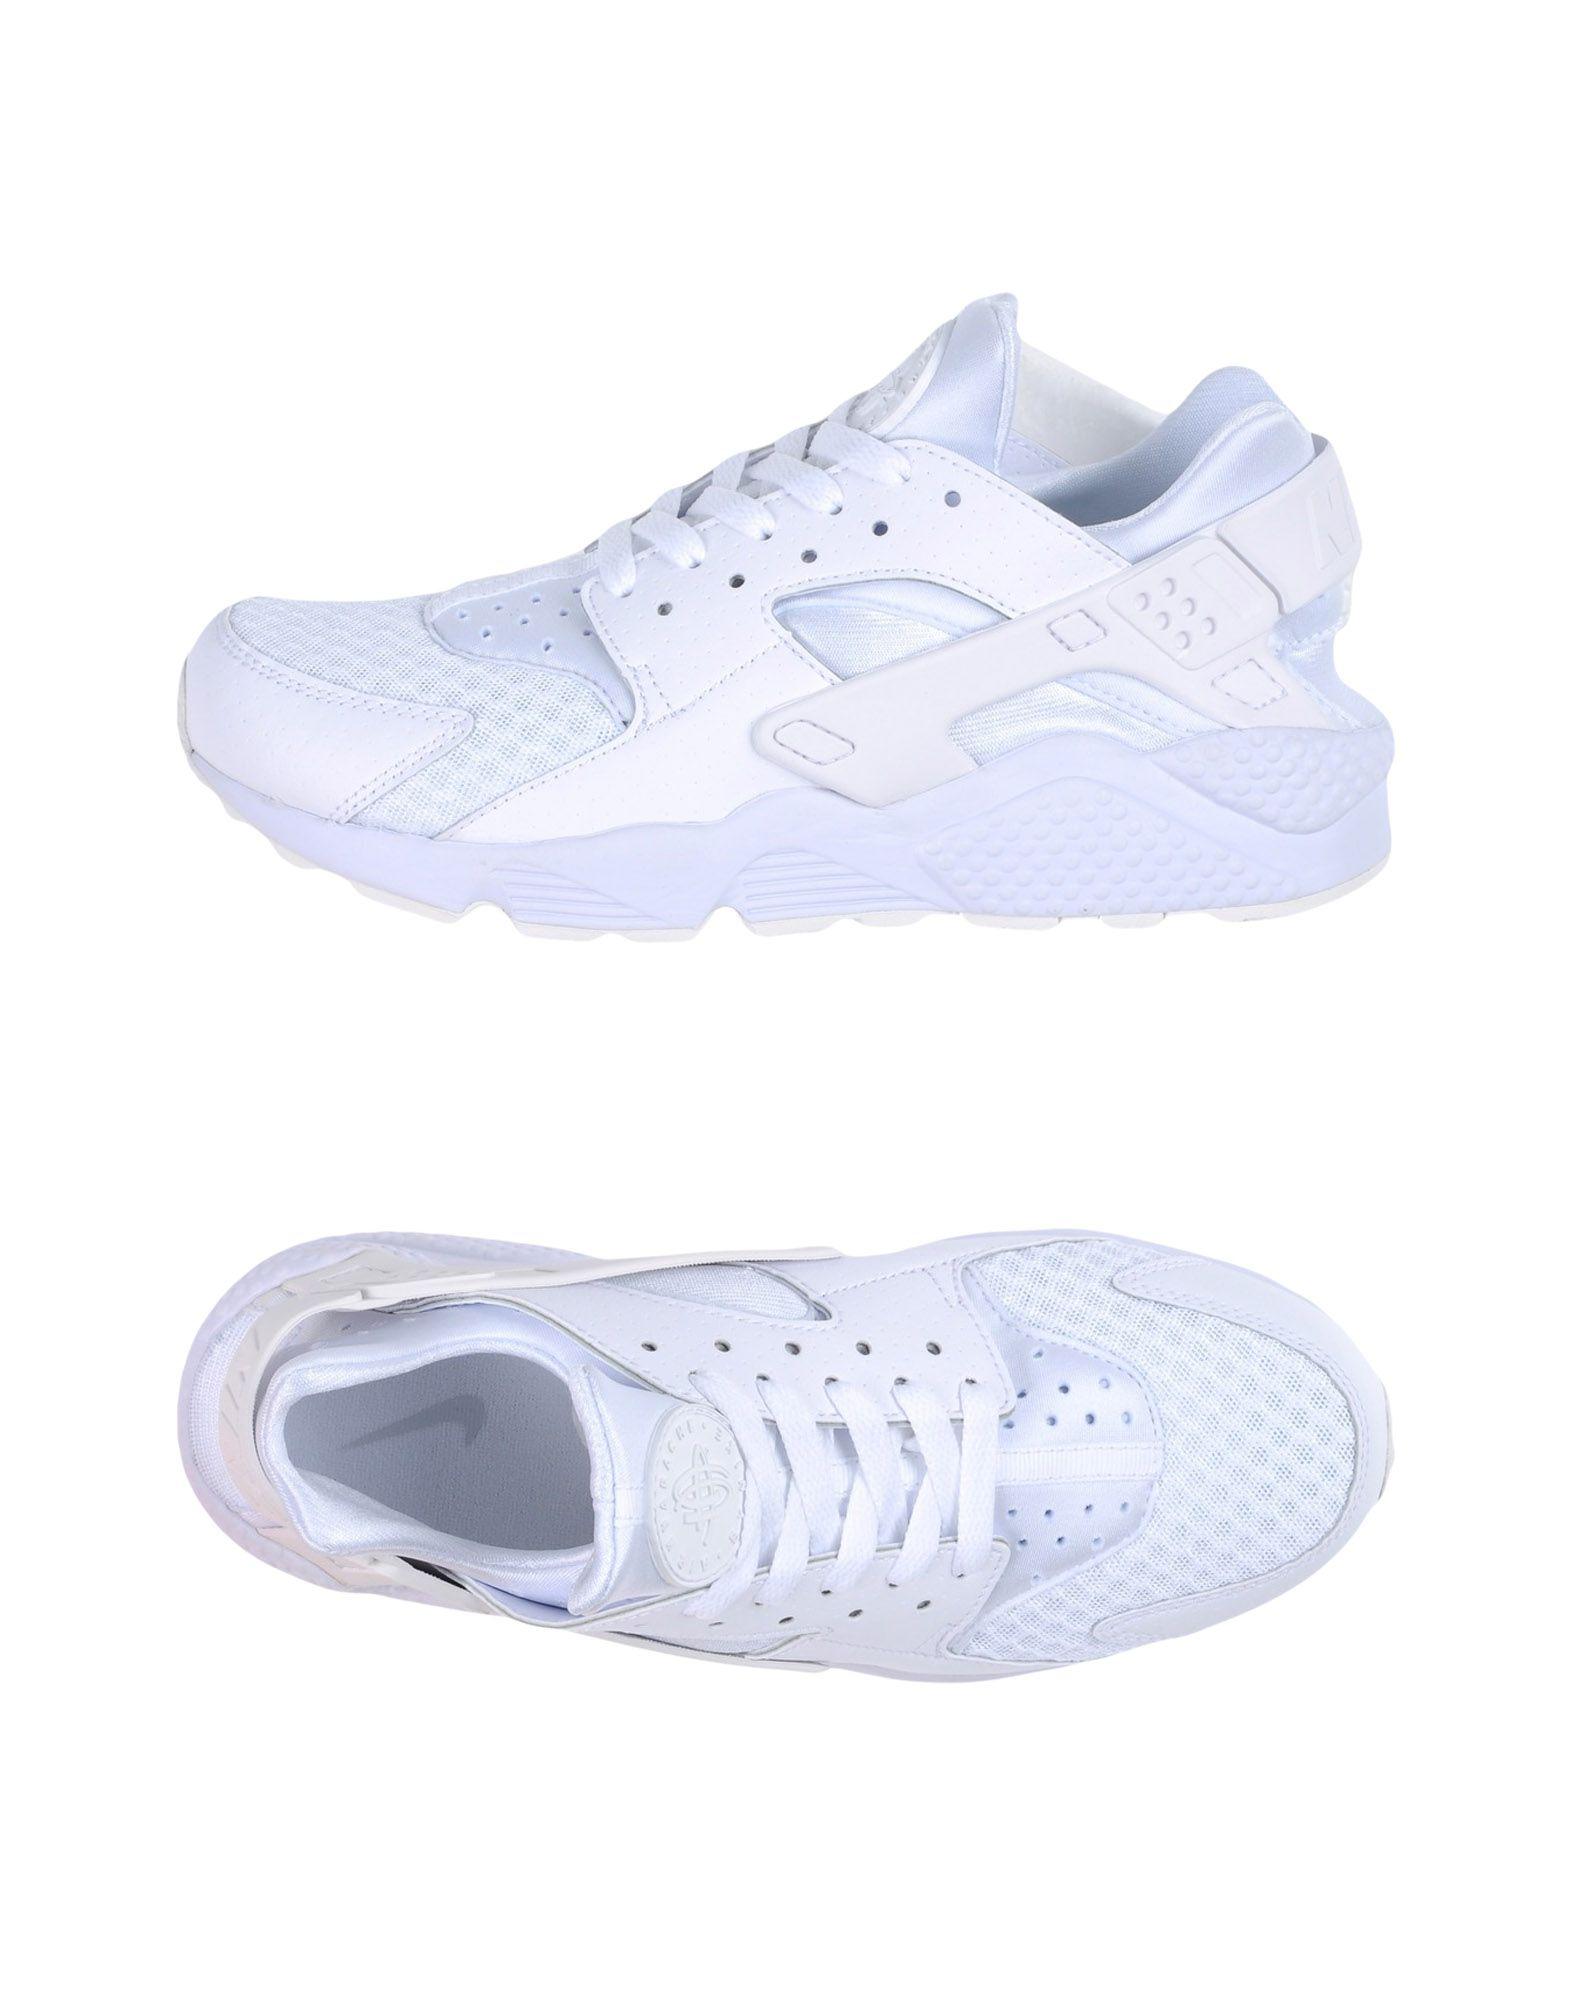 11336535AM Nike Sneakers Herren  11336535AM  Heiße Schuhe 9d9da9